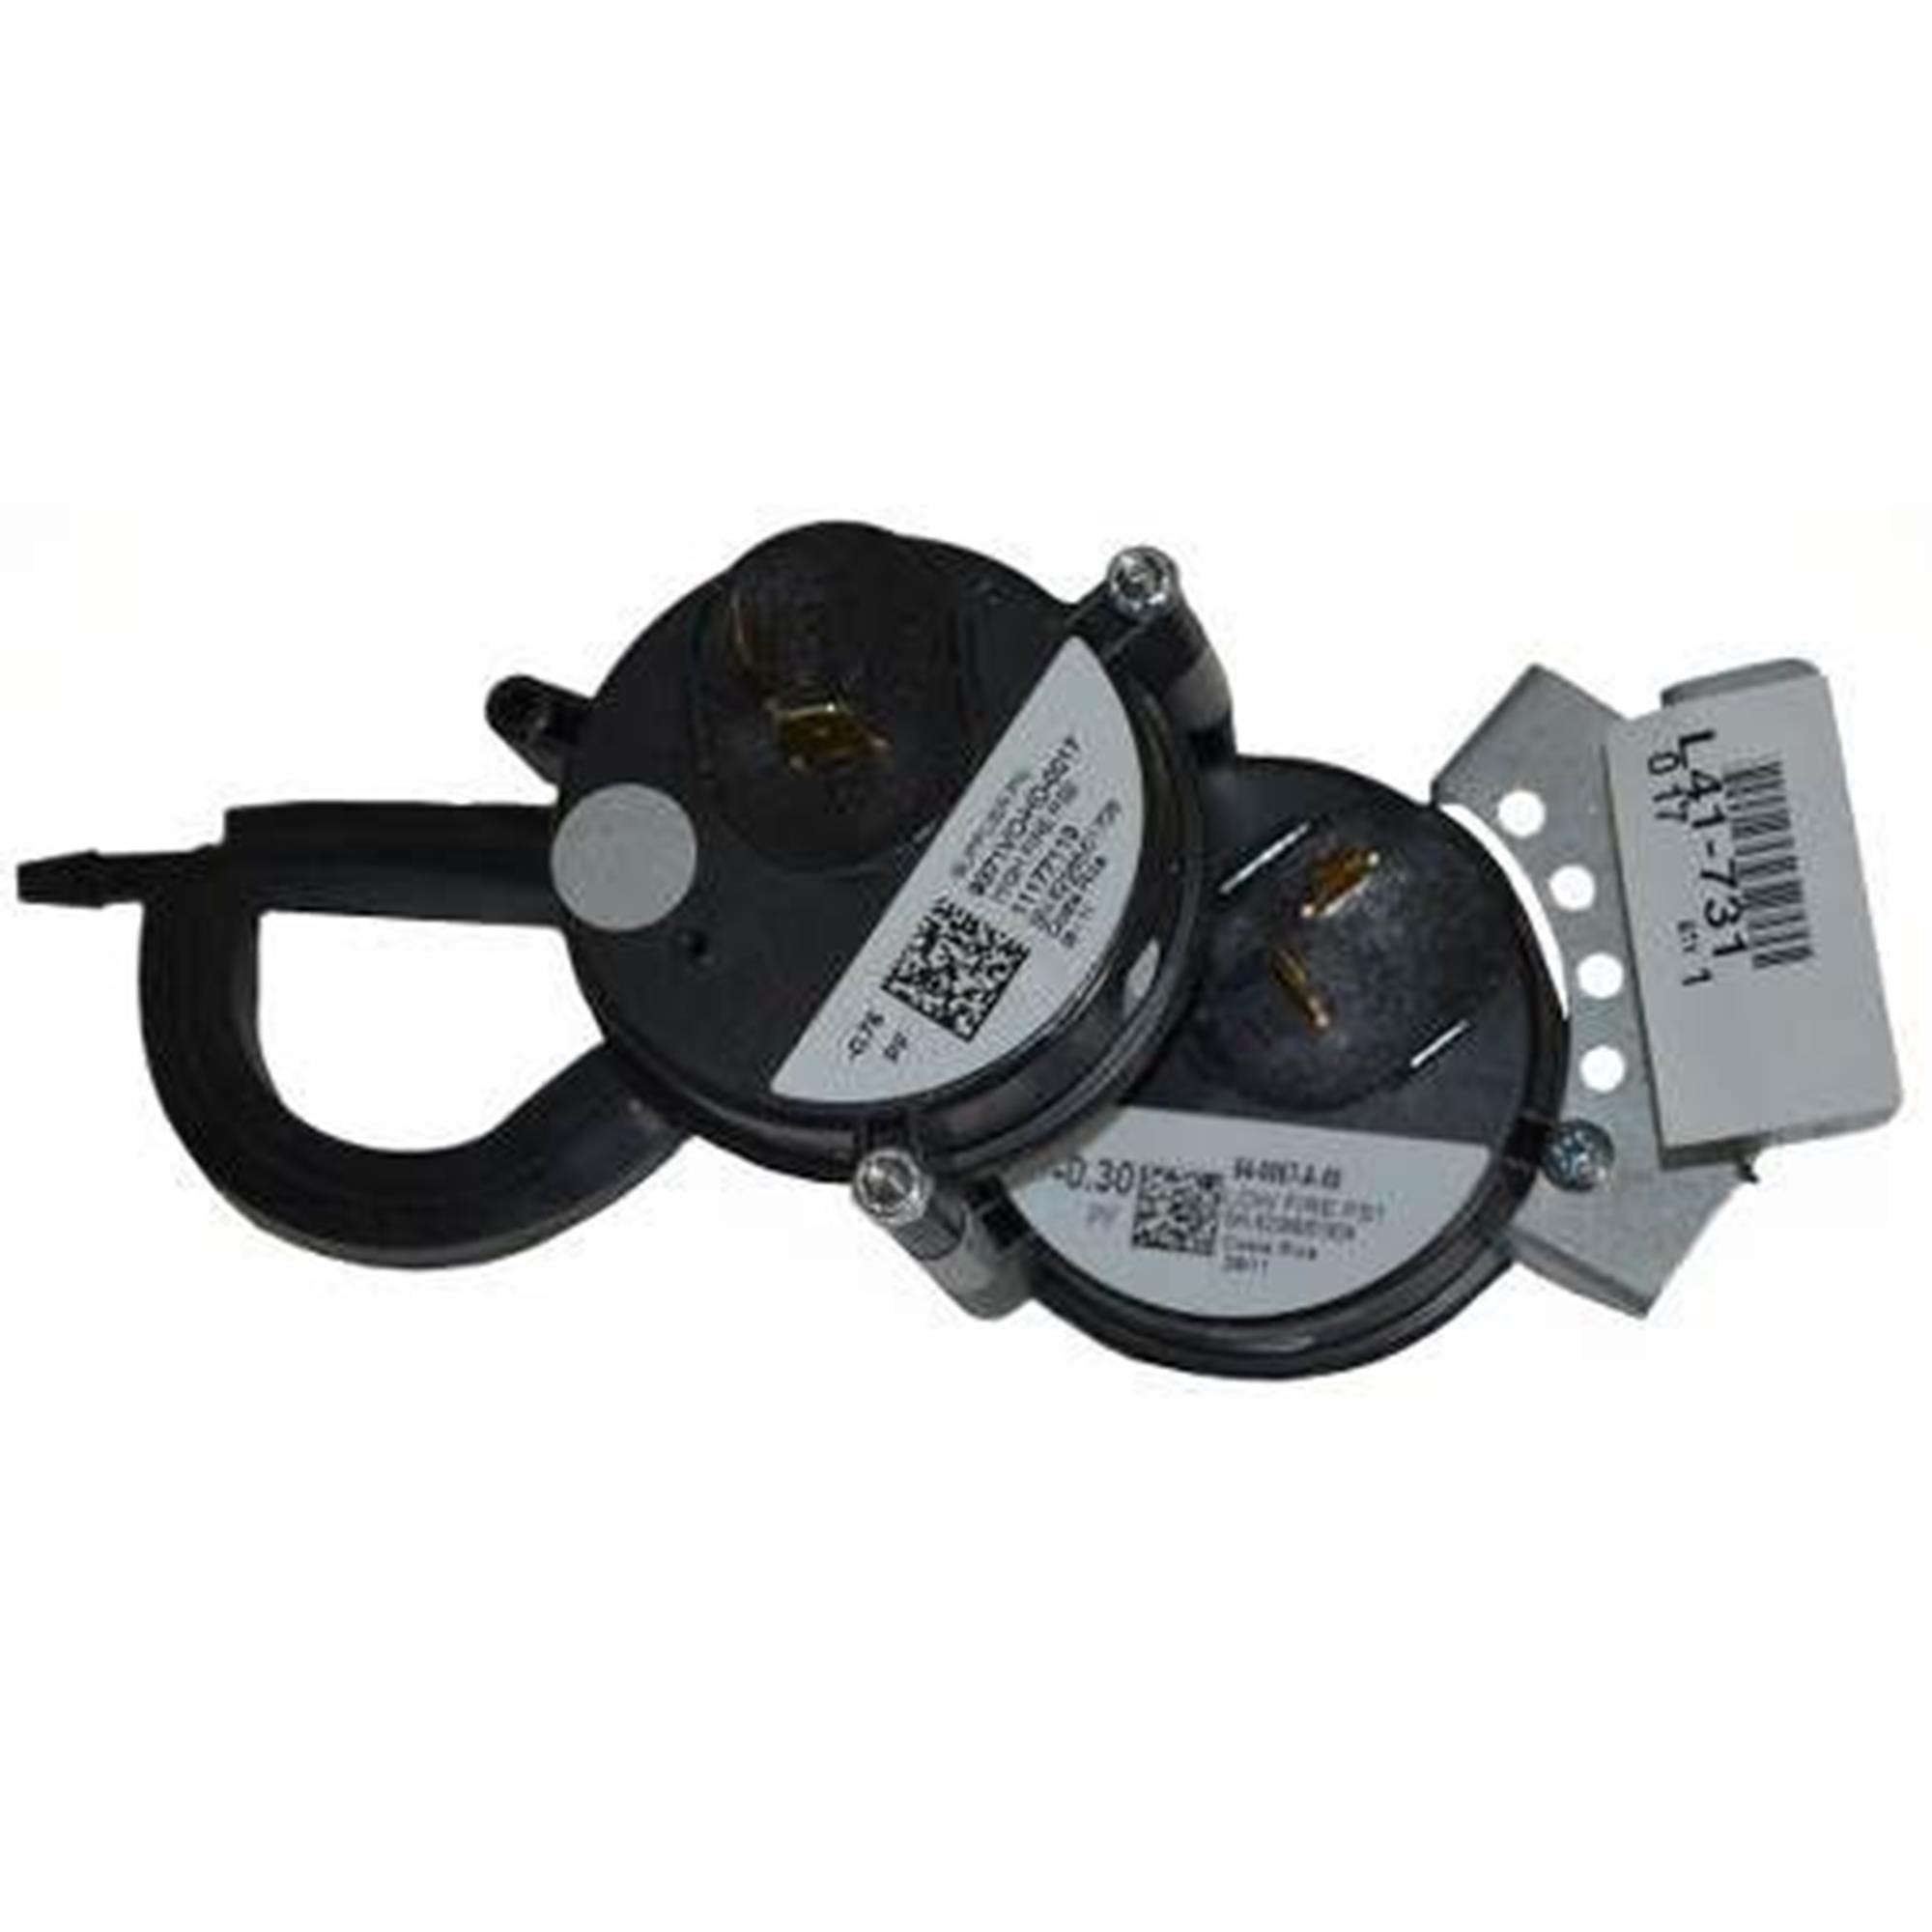 Goodmans 11177113 Goodman Air Pressure Switch DU 0.30/0.7...